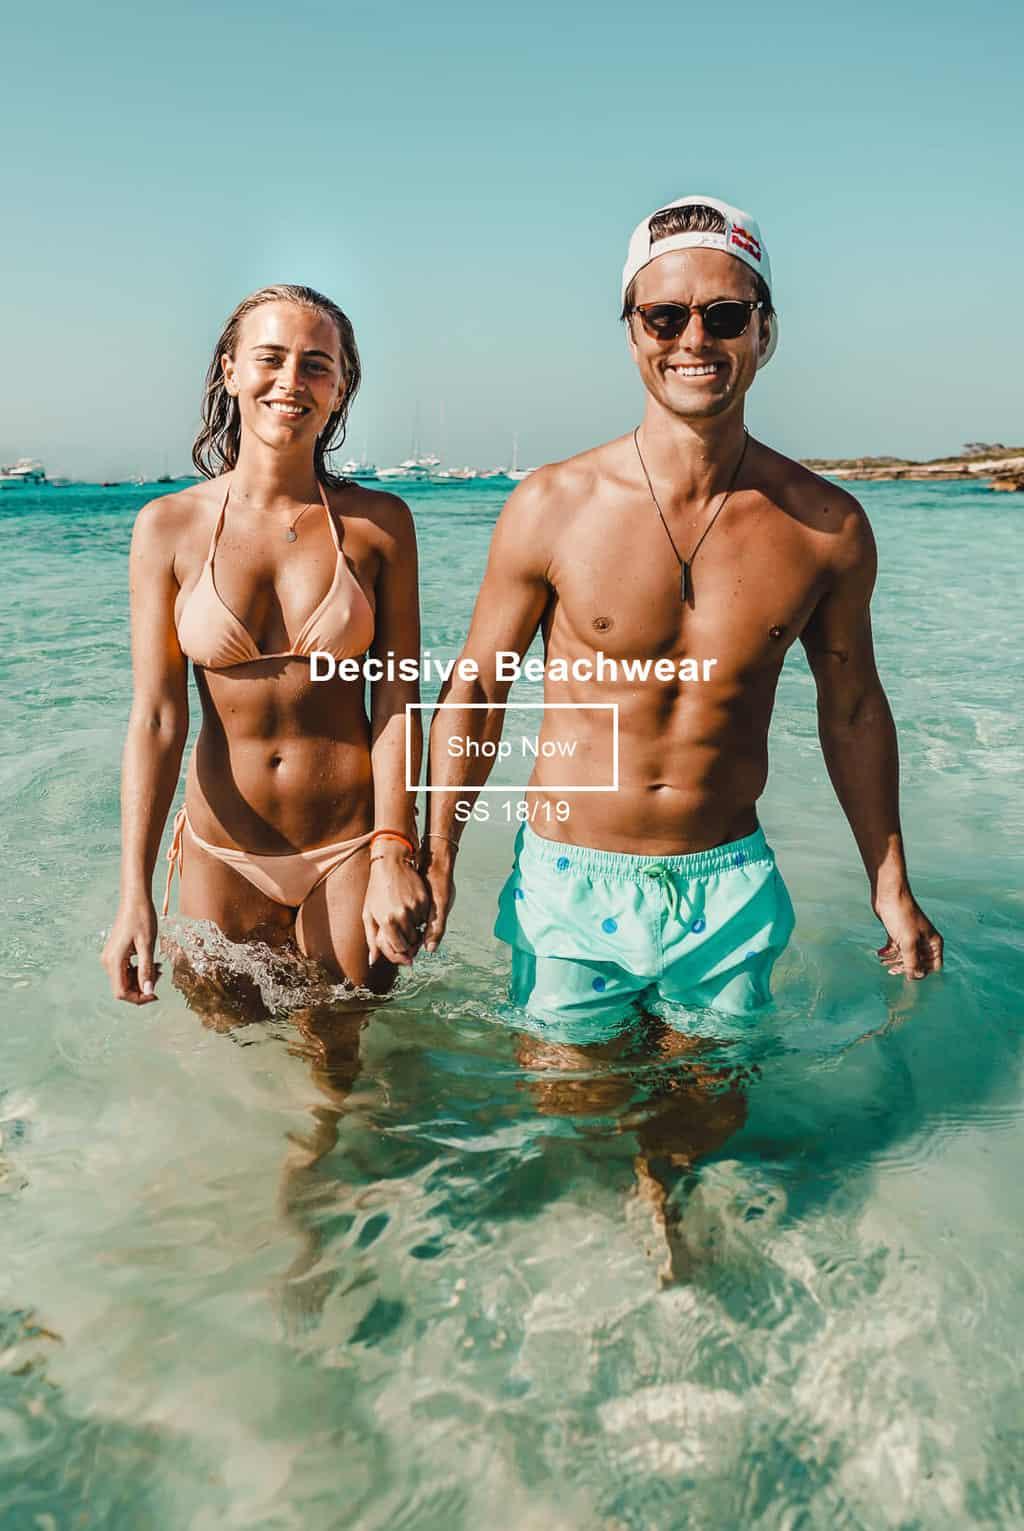 Decisive Jon Olsson Swim Shorts designer Mobile